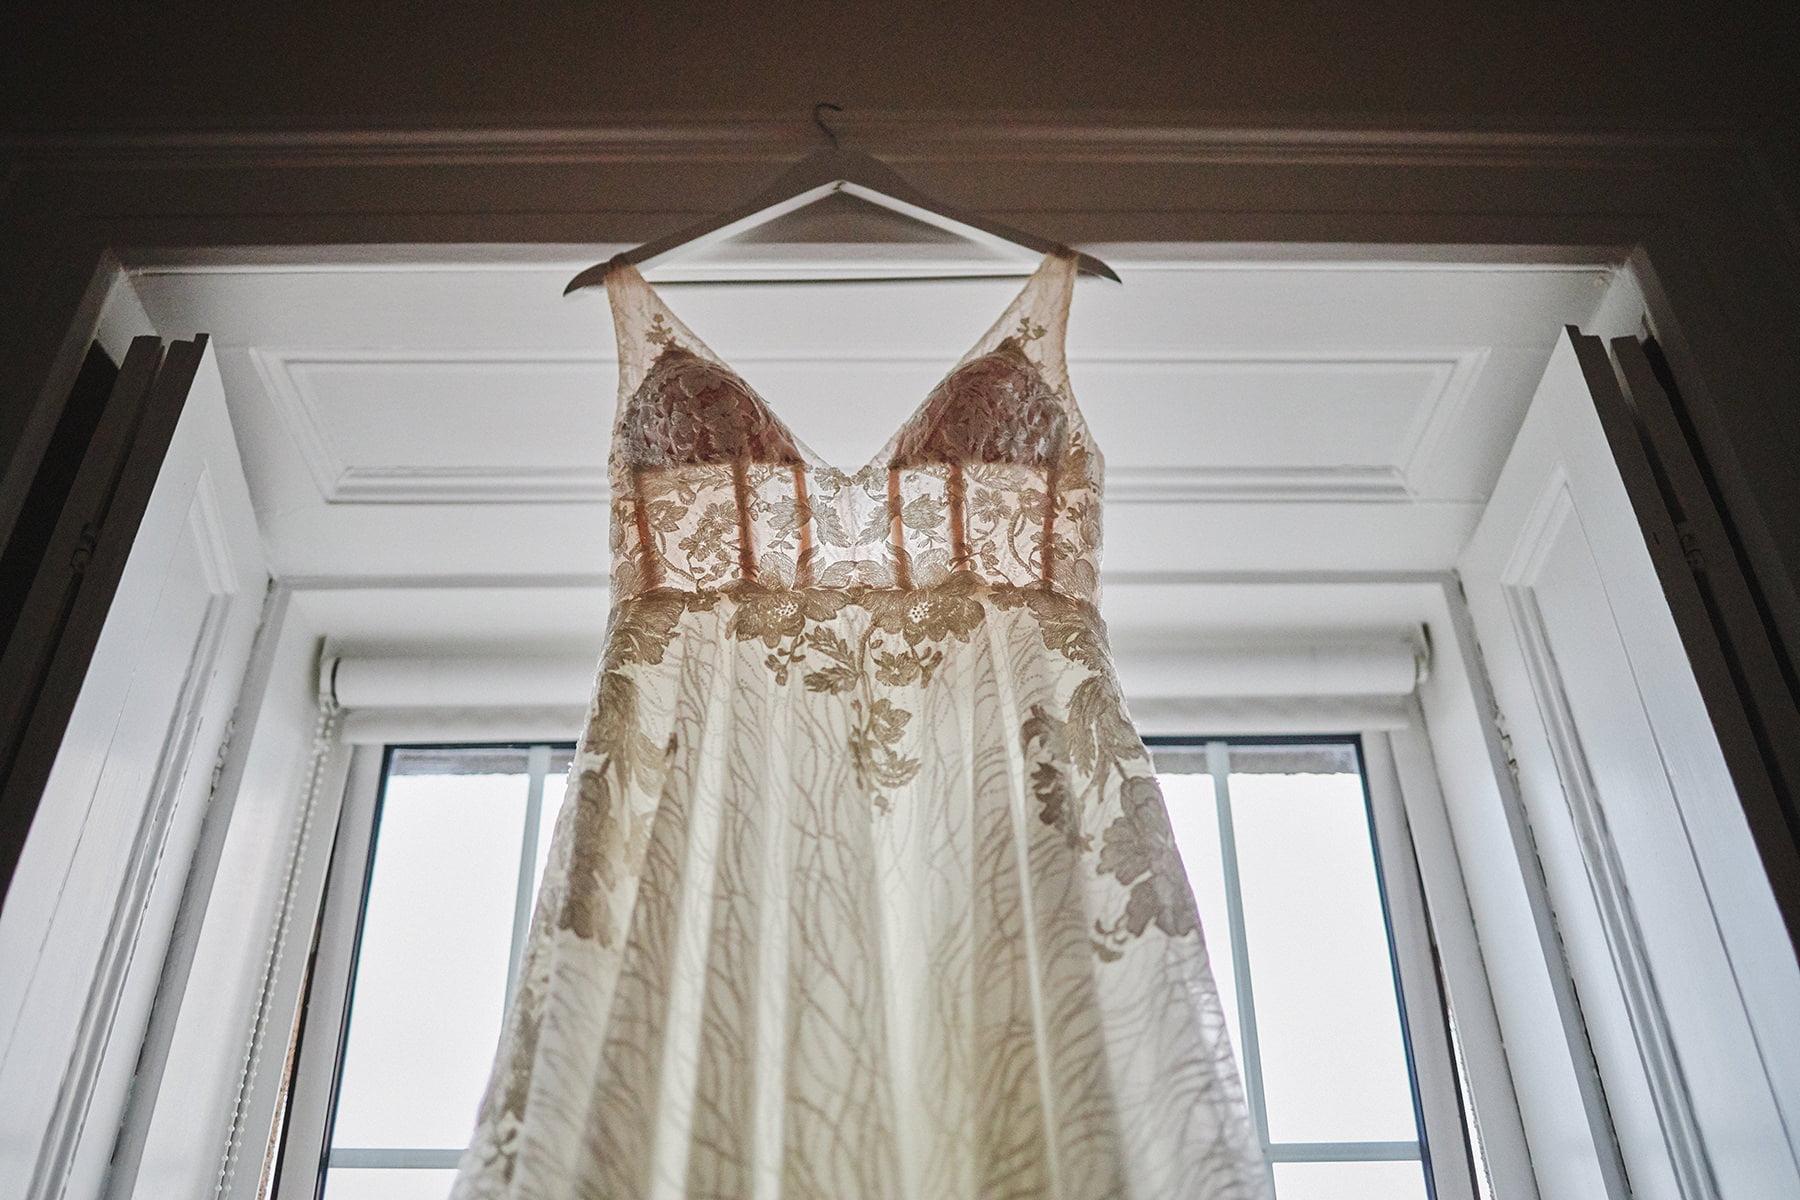 POWERSCOURT HOTEL RESORT INTIMATE WEDDING 7